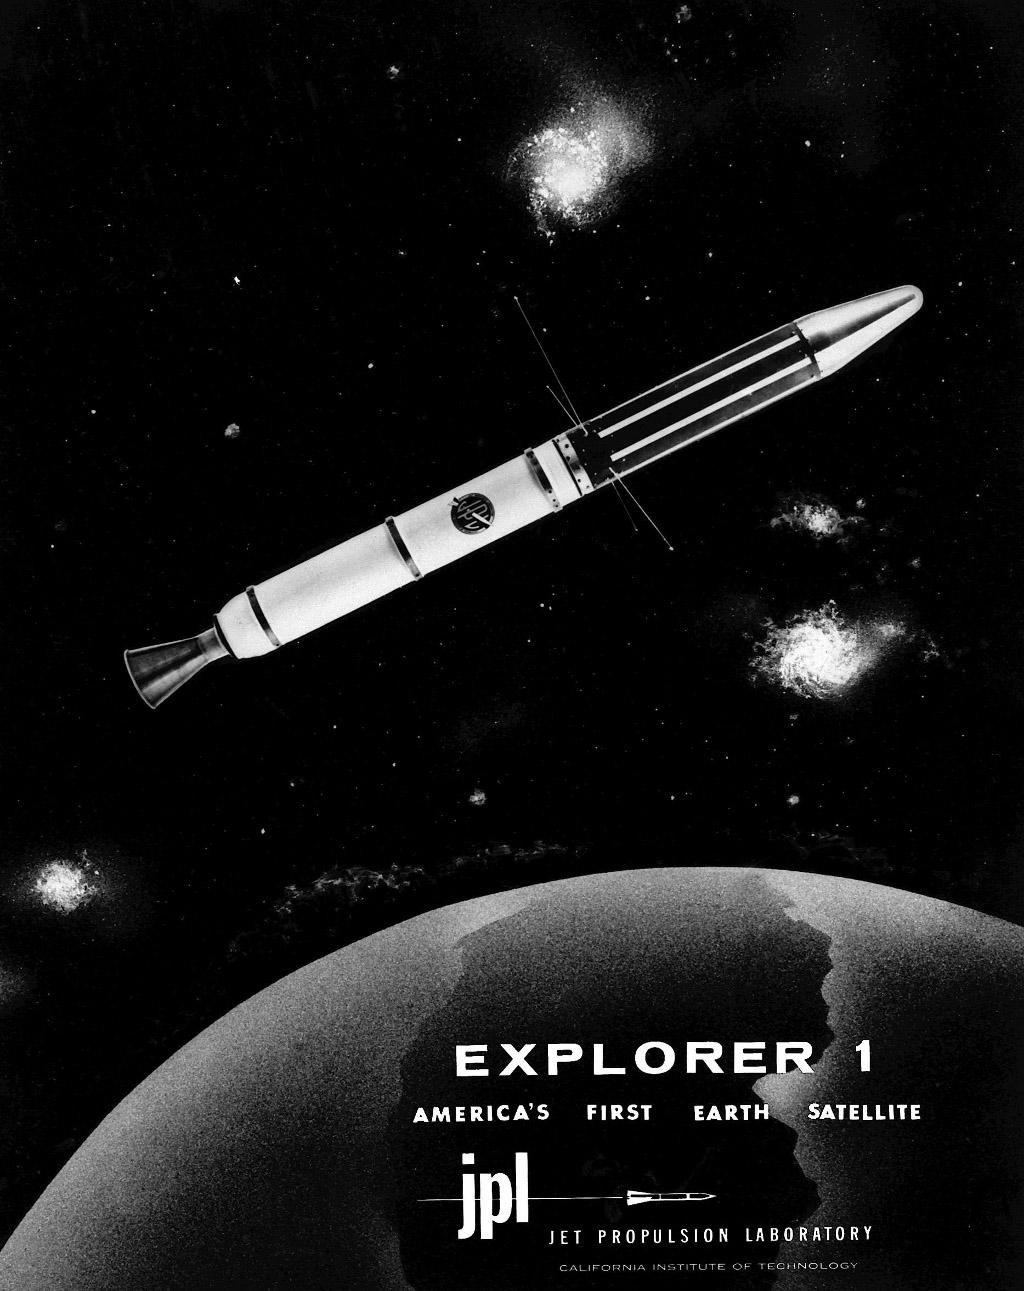 explorer 1 spacecraft - photo #6